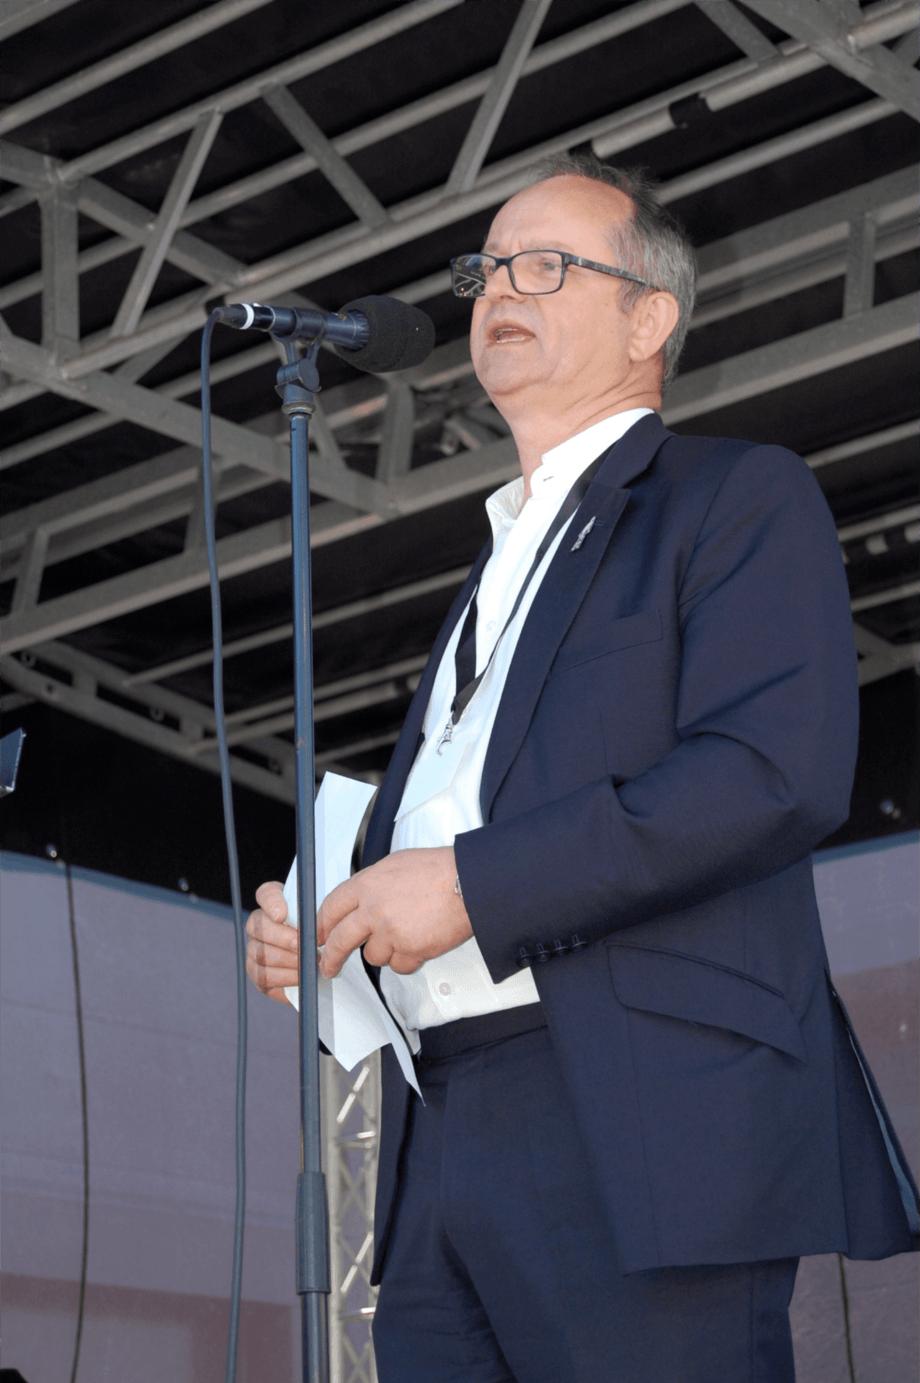 <p>CEO Malcom Pye i Benchmark plc. Foto: Harrieth Lundberg</p>